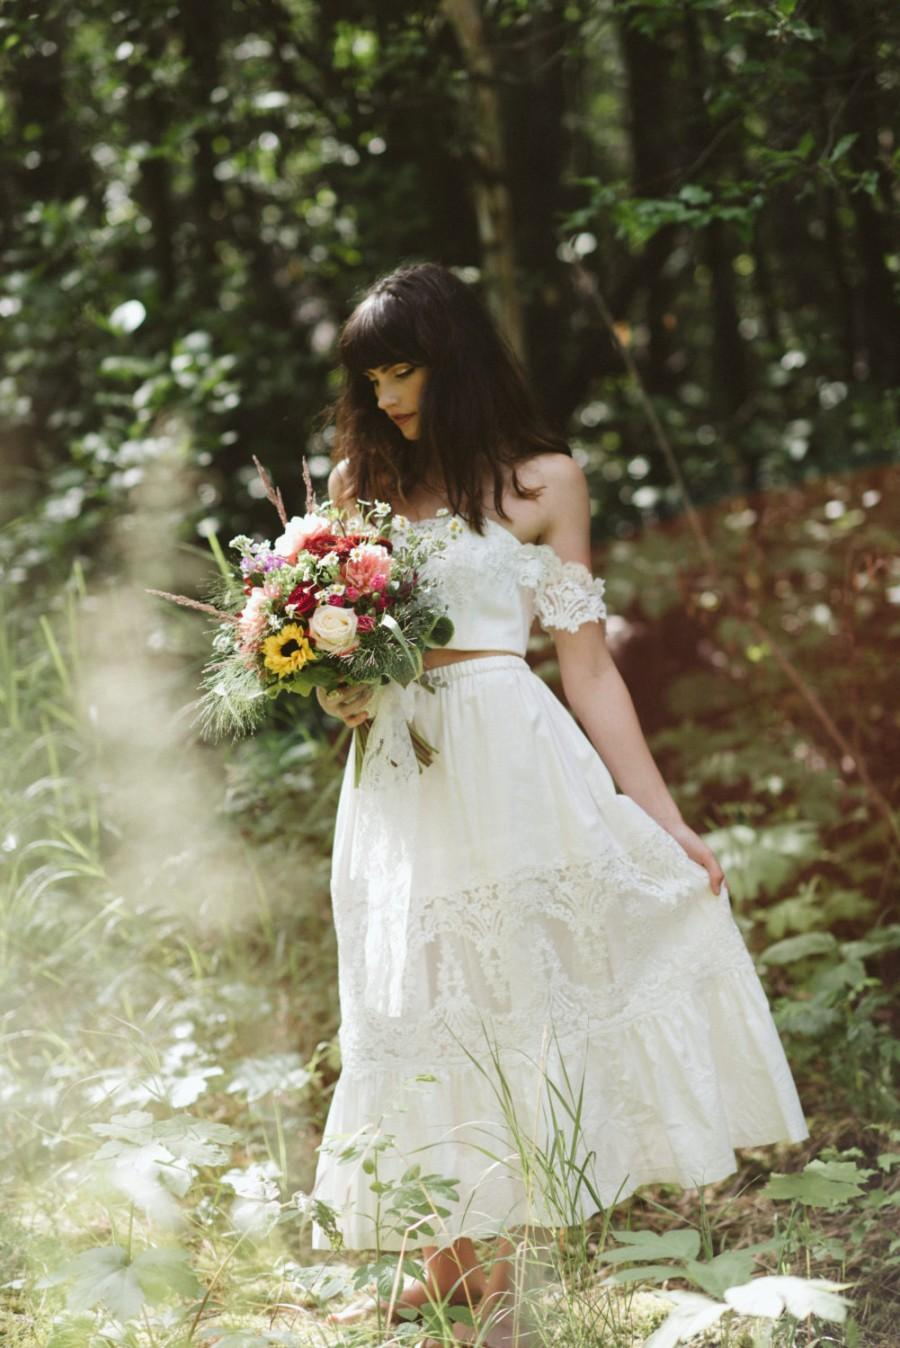 زفاف - Bridal Crop top and Bridal Petticoat skirt set, tiered lace skirt, wedding crop top, 2 piece prom dress